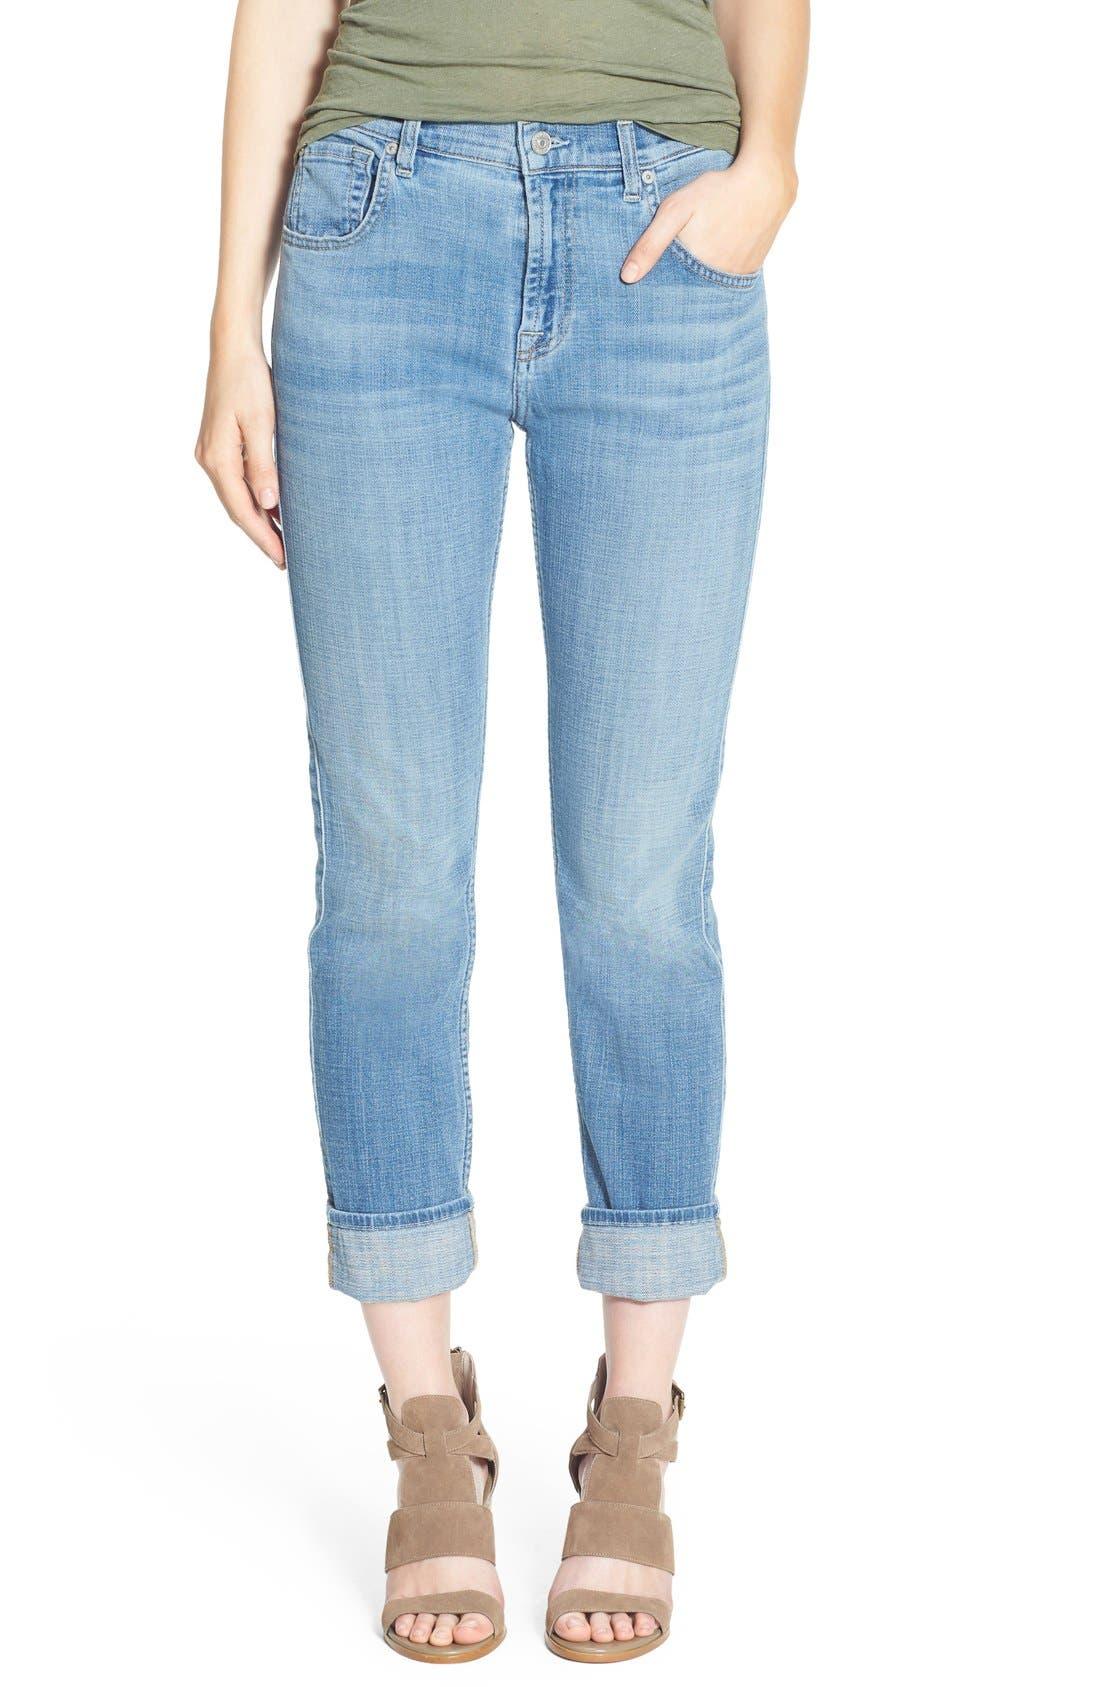 Alternate Image 1 Selected - 7 For All Mankind® 'Josefina' Relaxed Skinny Jeans (Medium Broken Twill)